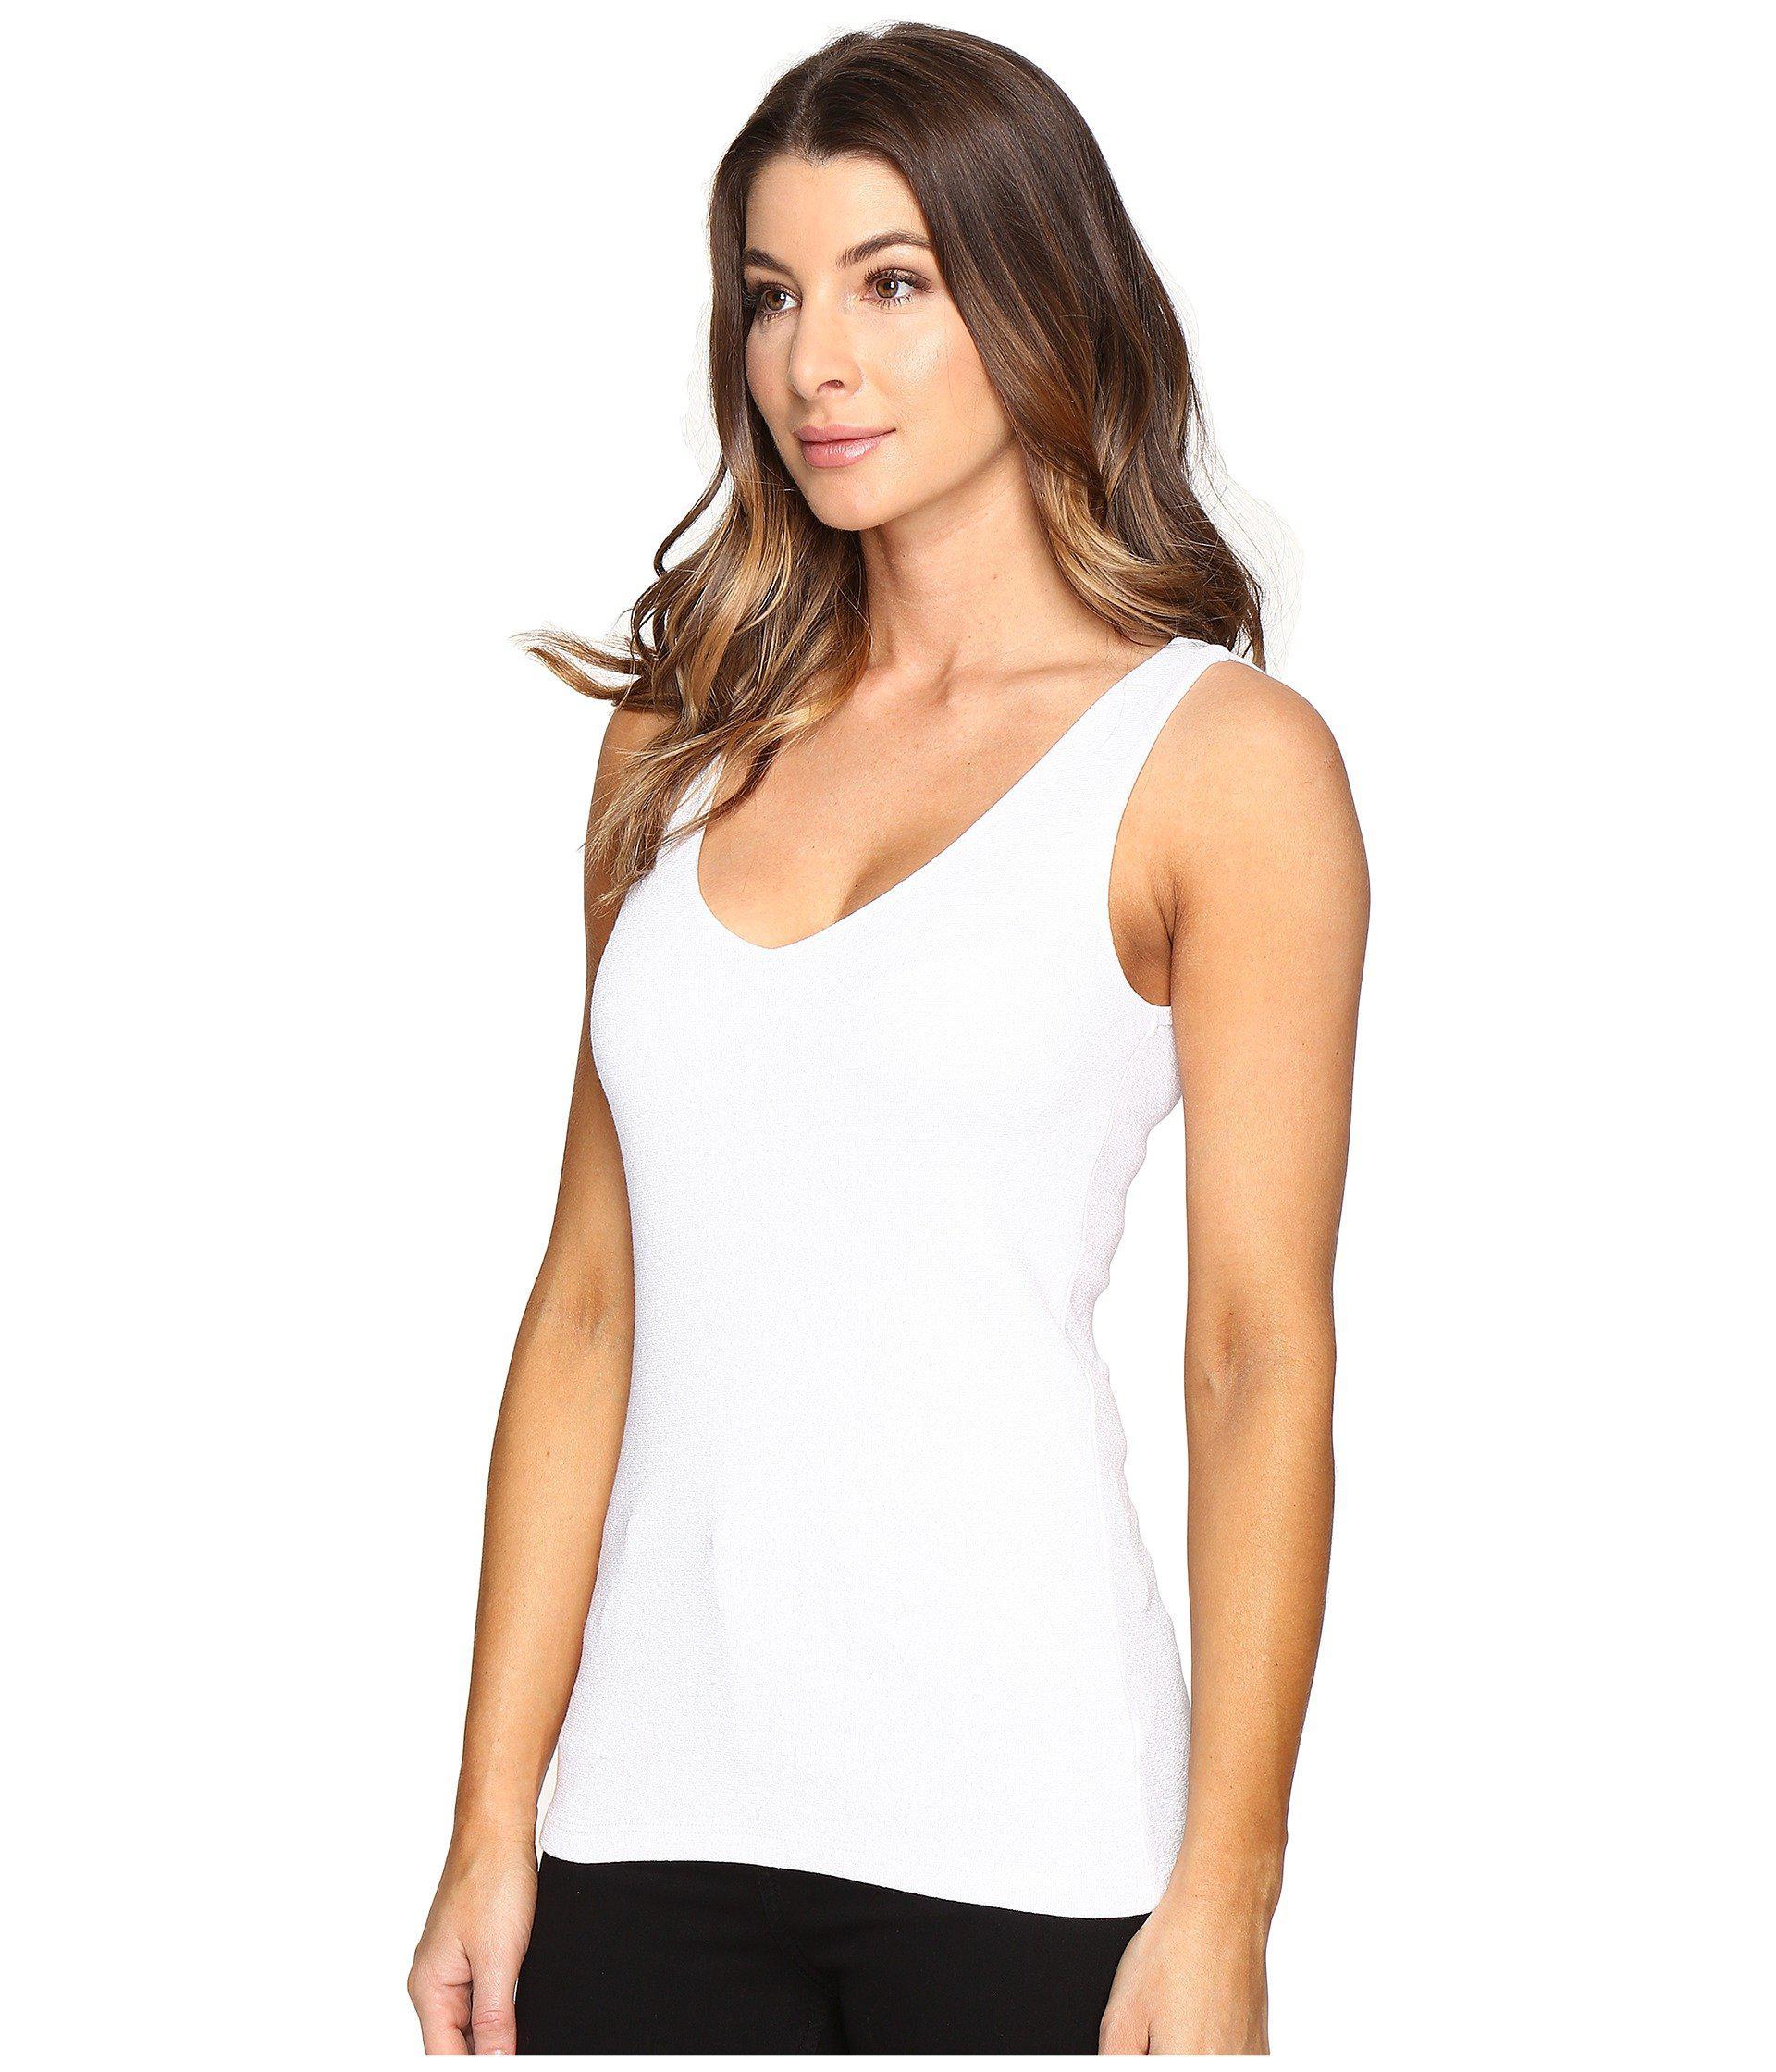 0daf0120d05ff Lyst - Michael Stars Shine Double Front V-neck Tank Top (black) Women s  Sleeveless in White